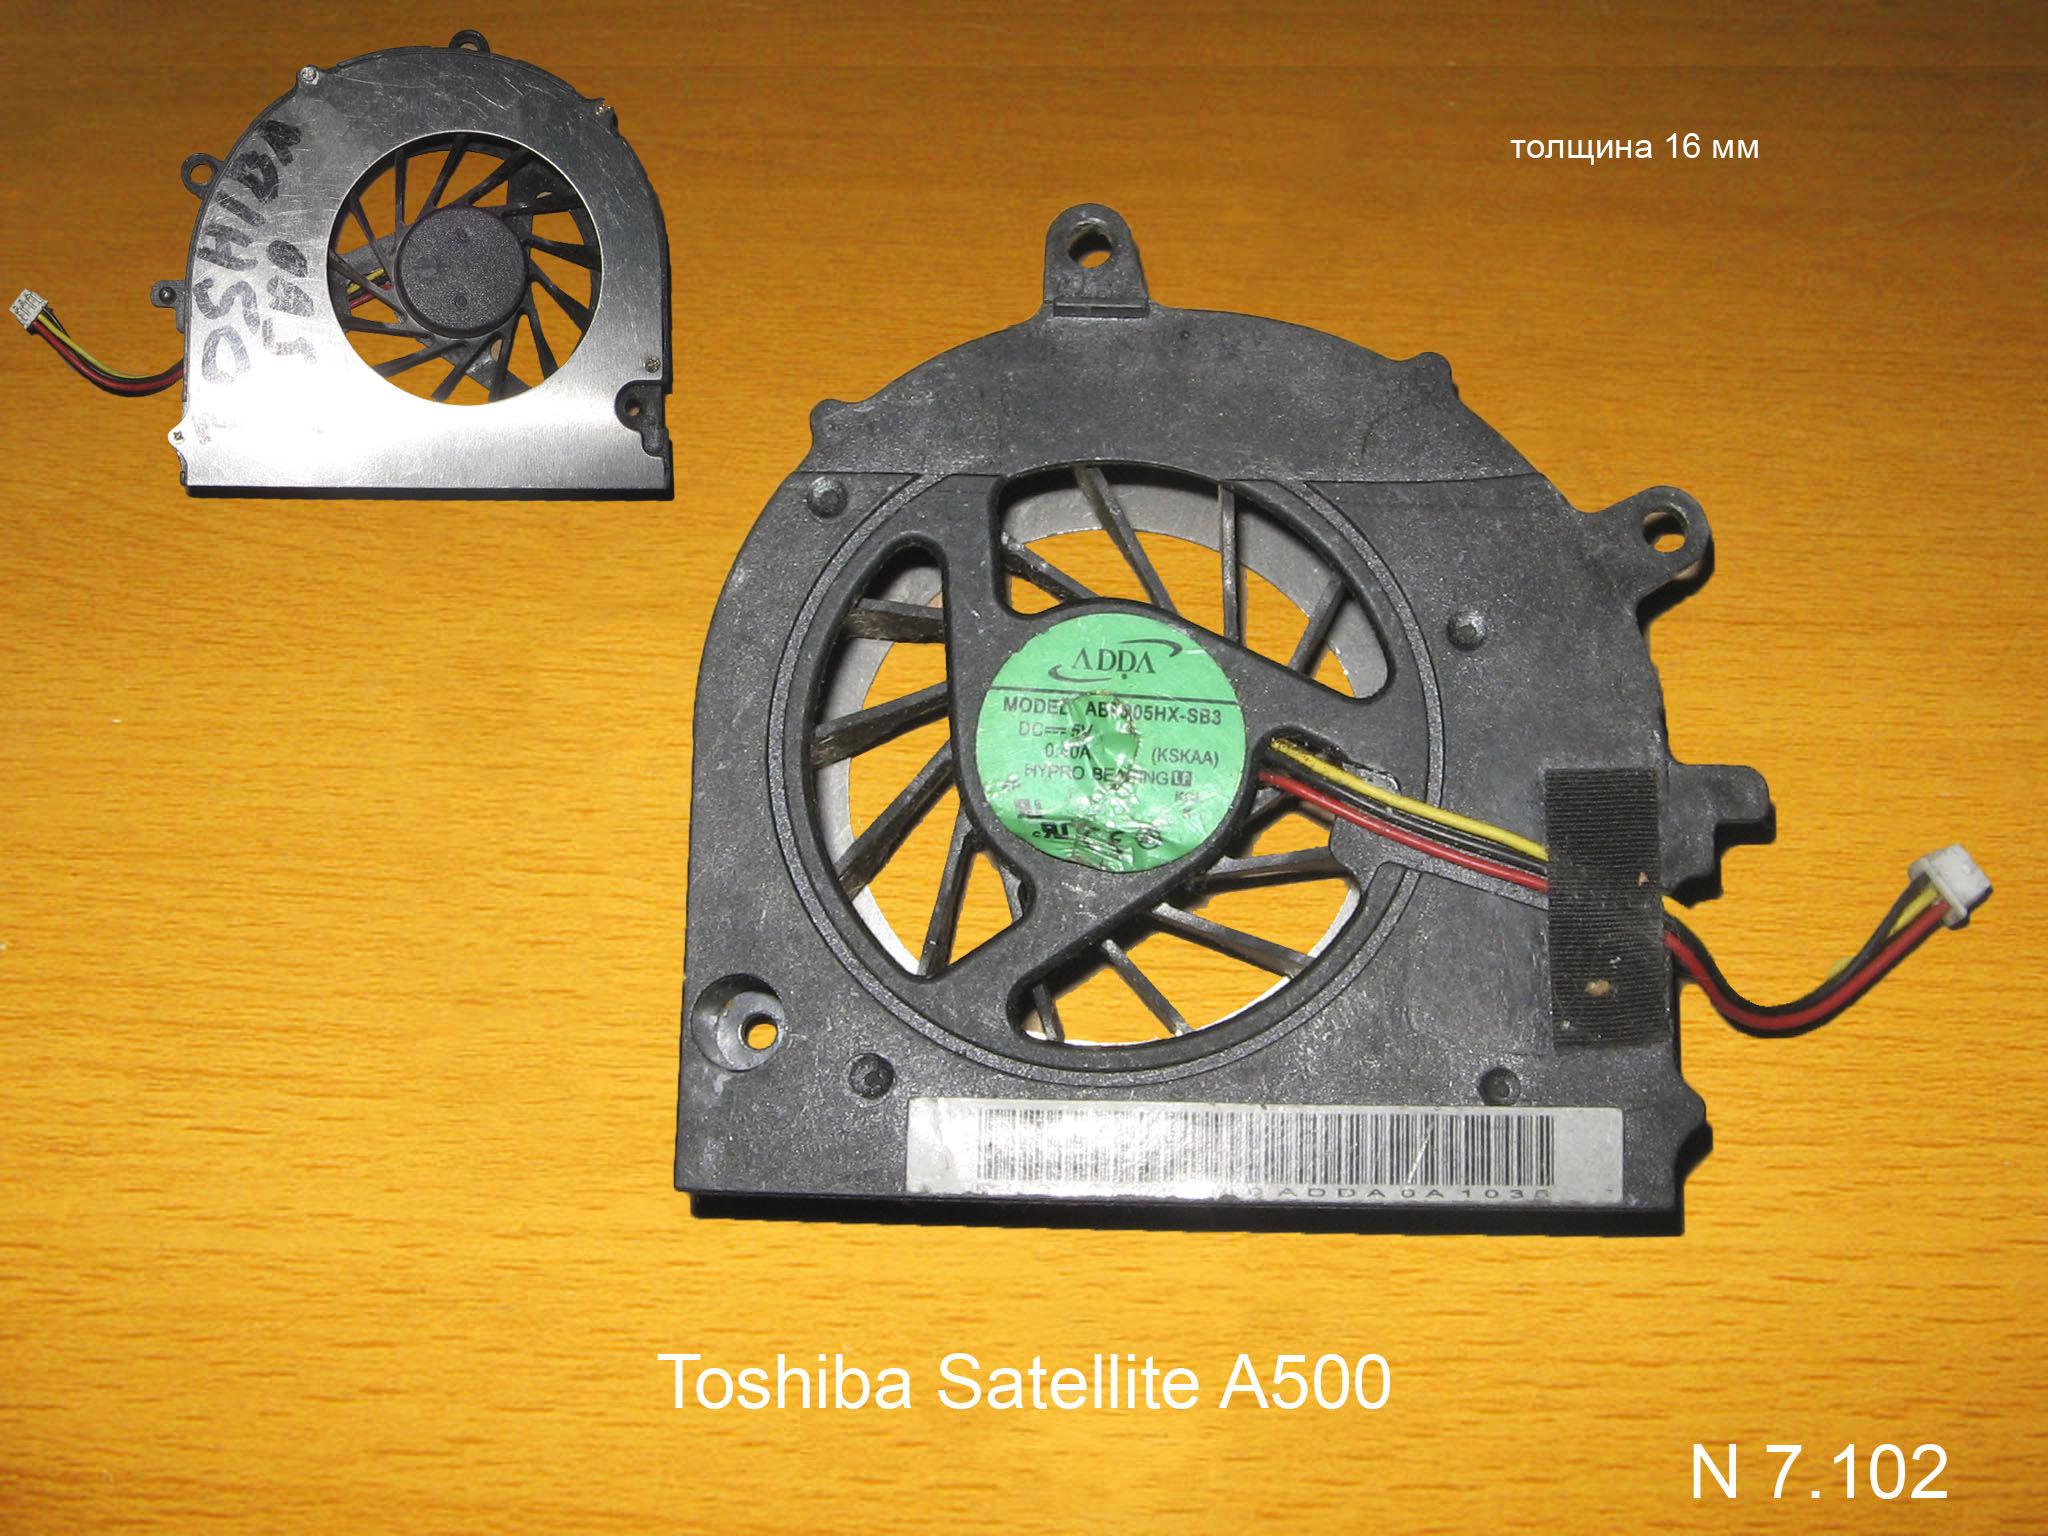 Toshiba Satellite A500 № 7.104   УВЕЛИЧИТЬ